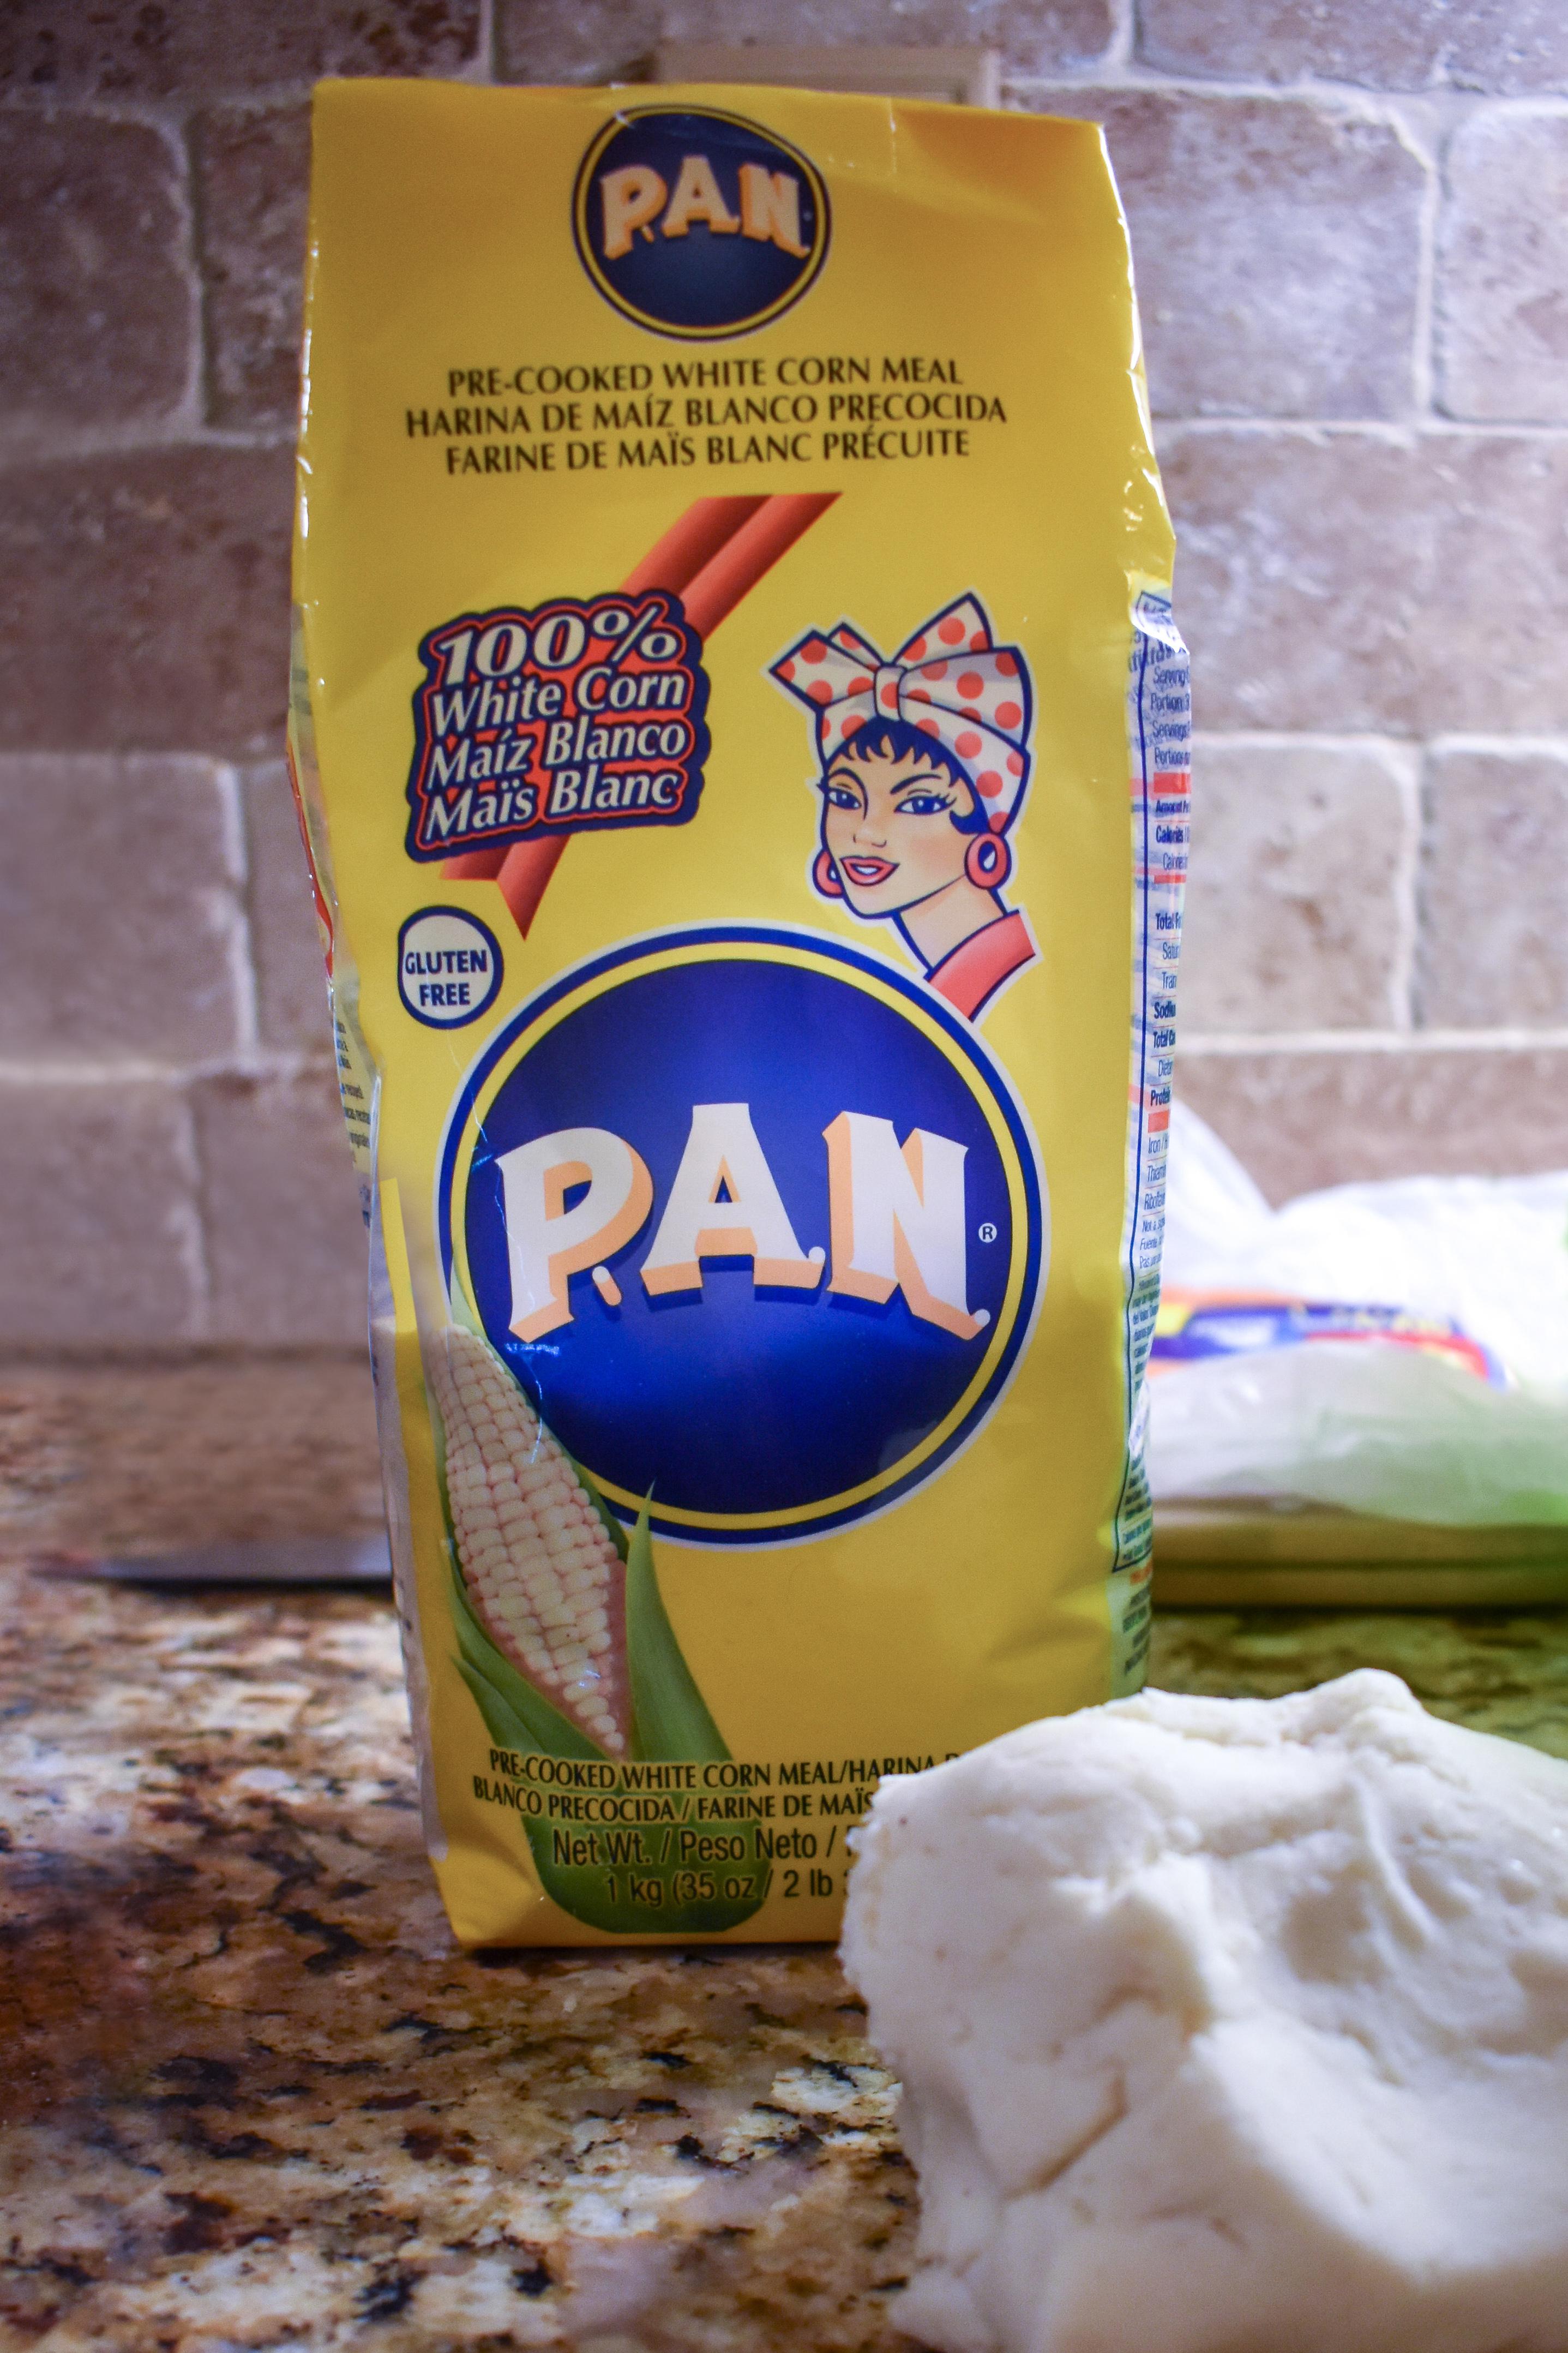 Colombian Recalentado- PAN cornmeal